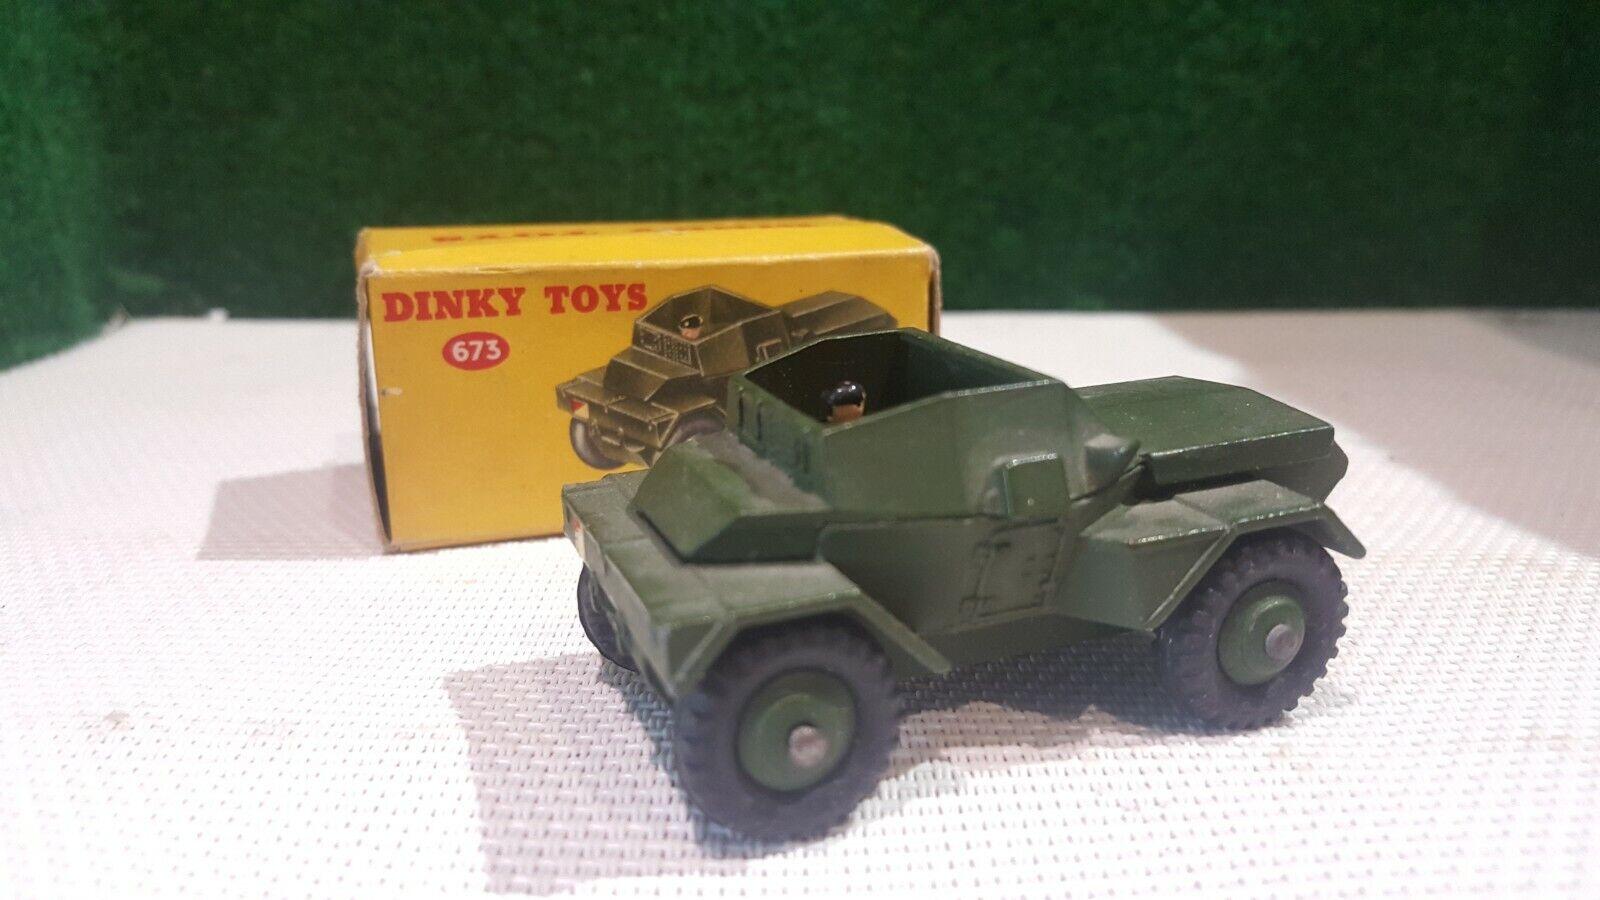 DINKY giocattoli Militaires réf   673 en boite